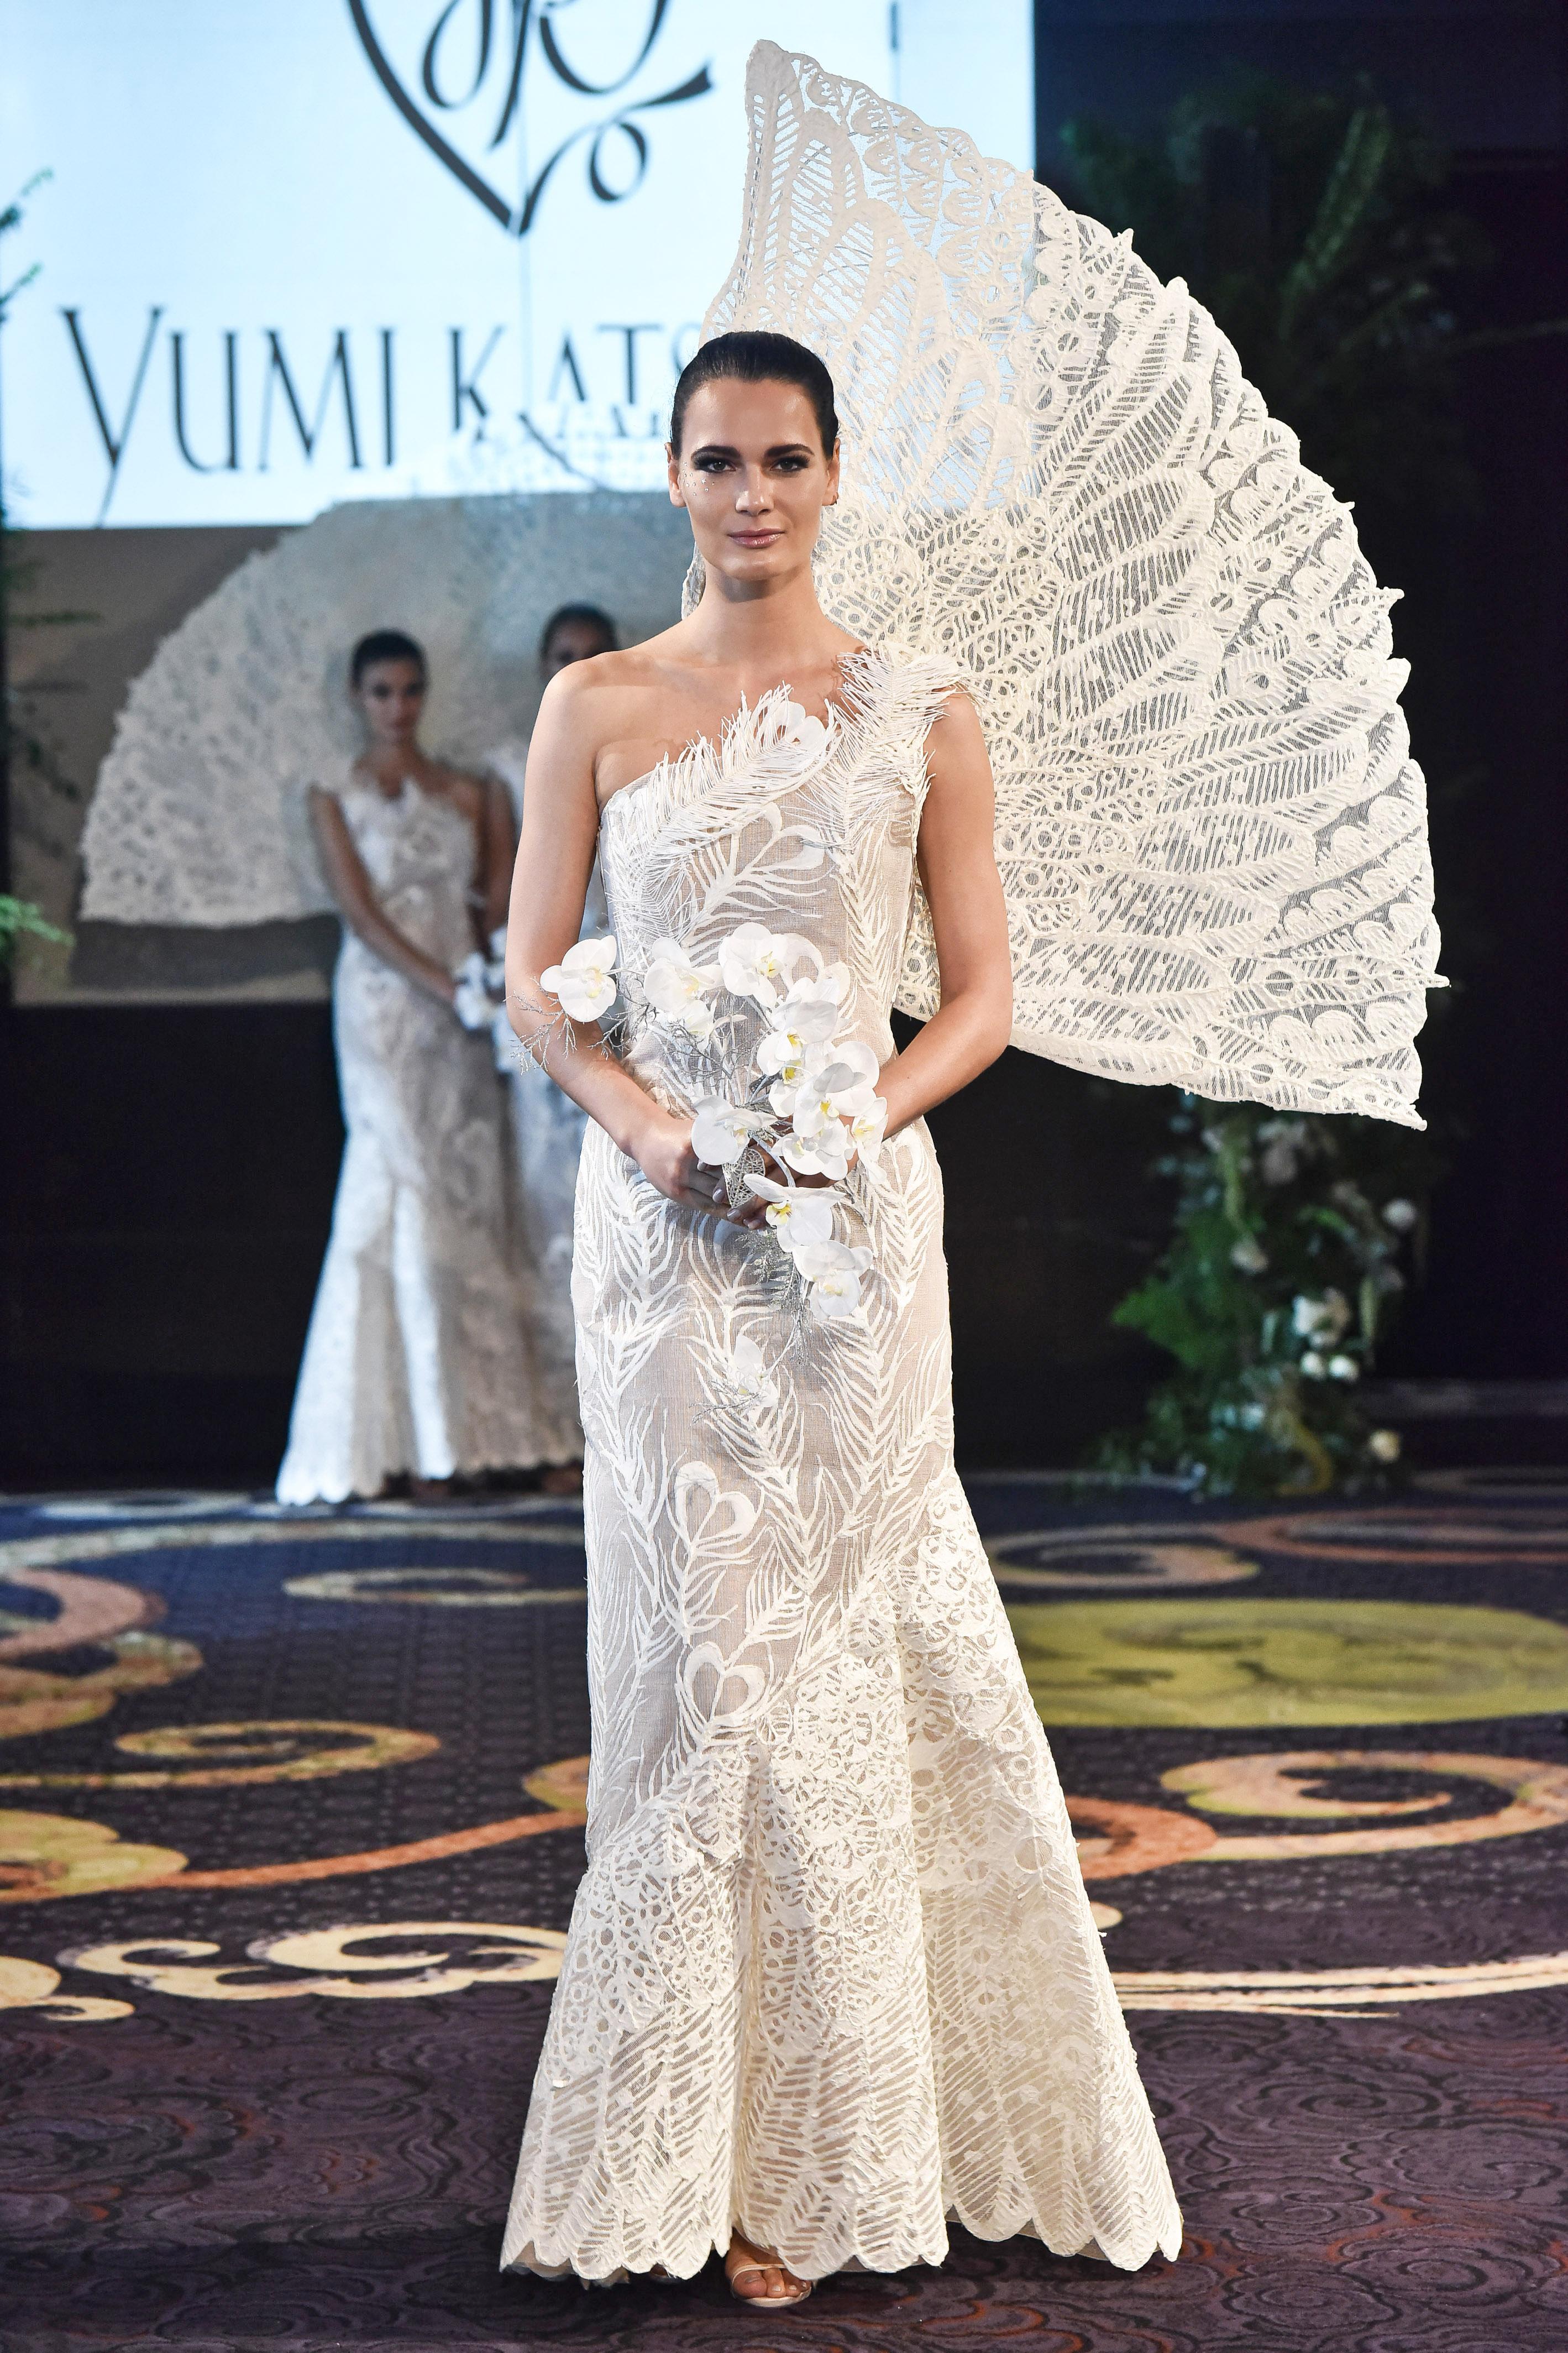 yumi katsura white one-strap trumpet with feather applique wedding dress fall 2018